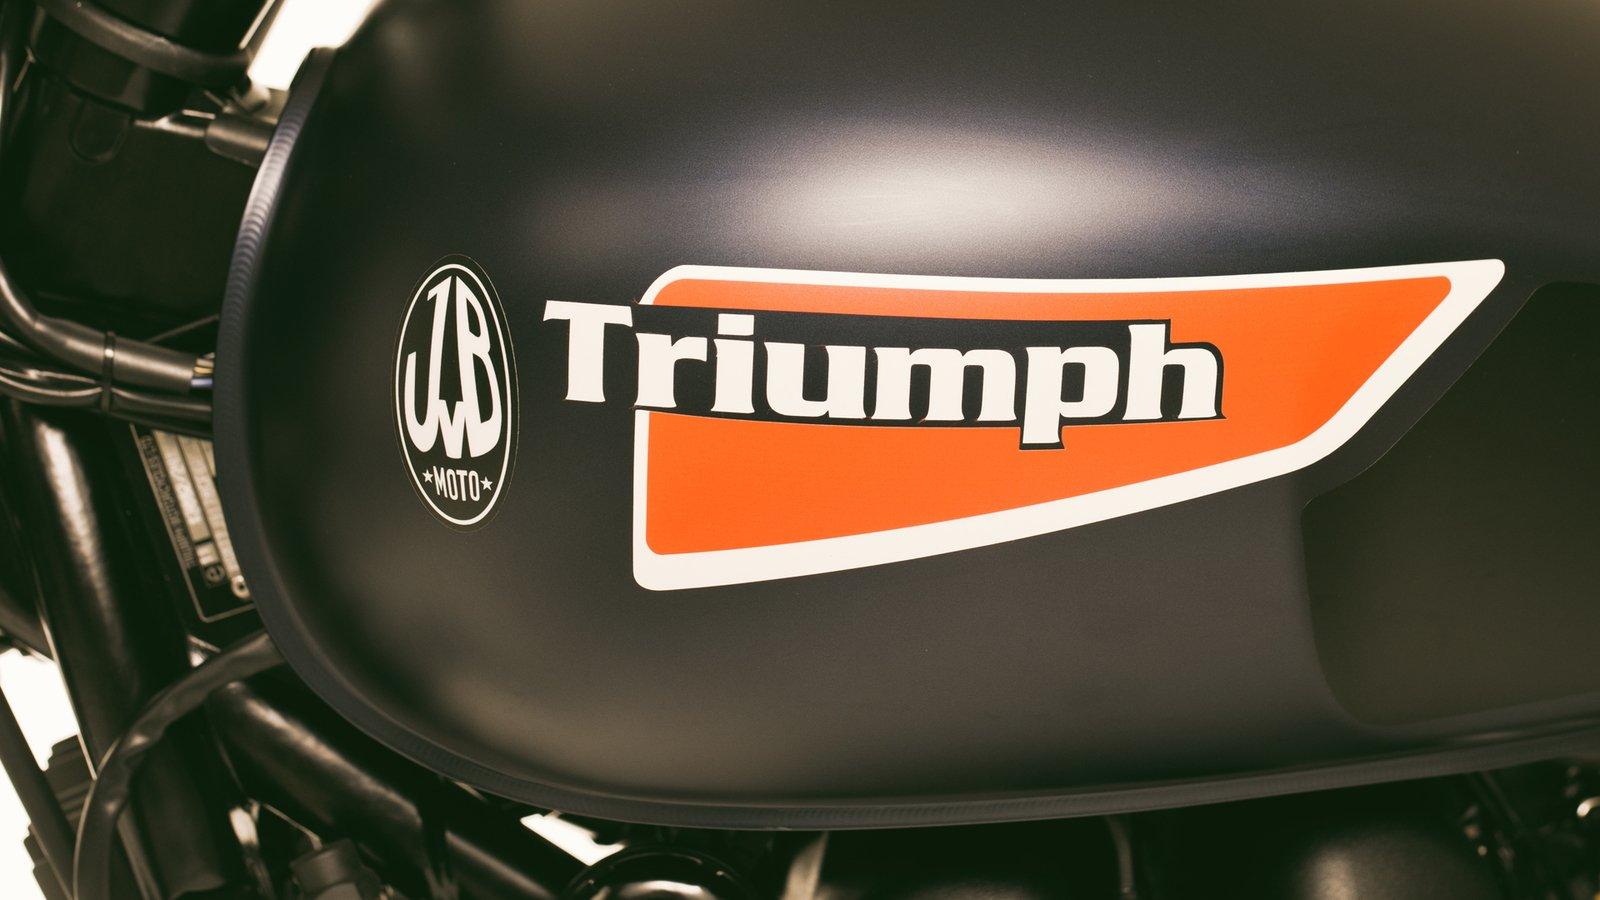 Triumph Scrambler 865 & 865EFI 2006 and up RH/LH Fuel Tank Decal Set (7 pcs)  JVB0028